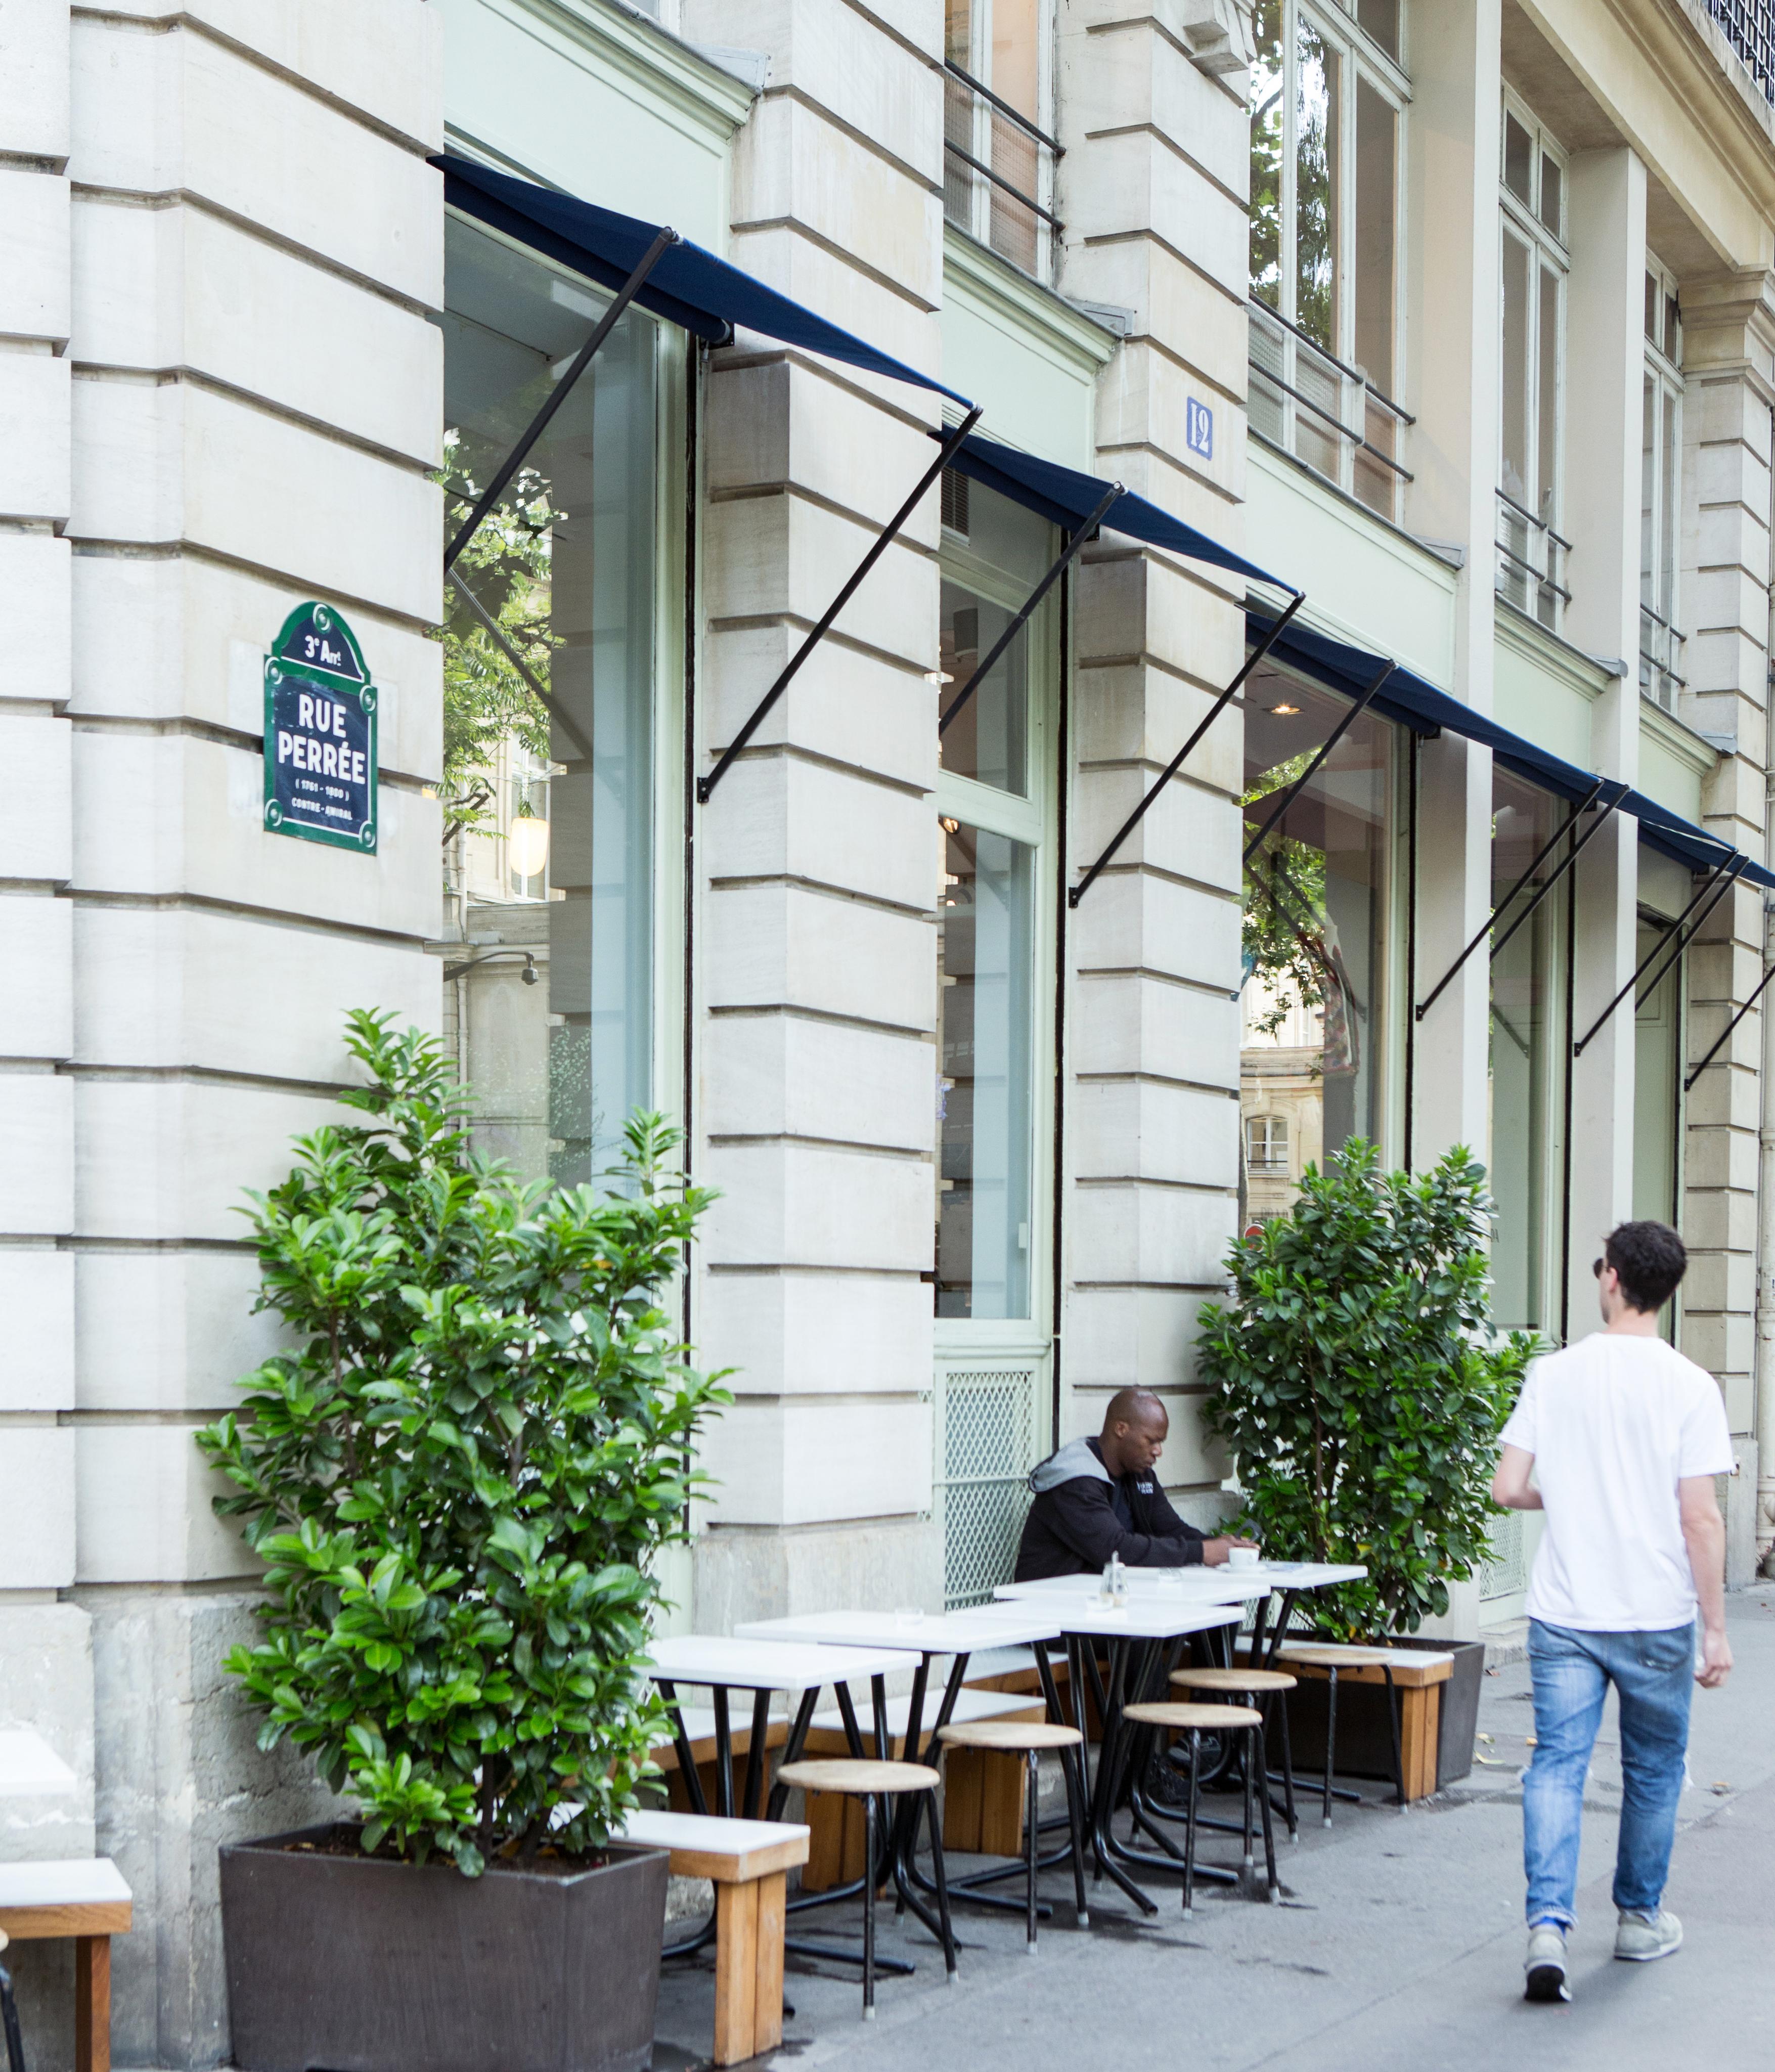 heidi middleton 39 s paris gourmet traveller. Black Bedroom Furniture Sets. Home Design Ideas